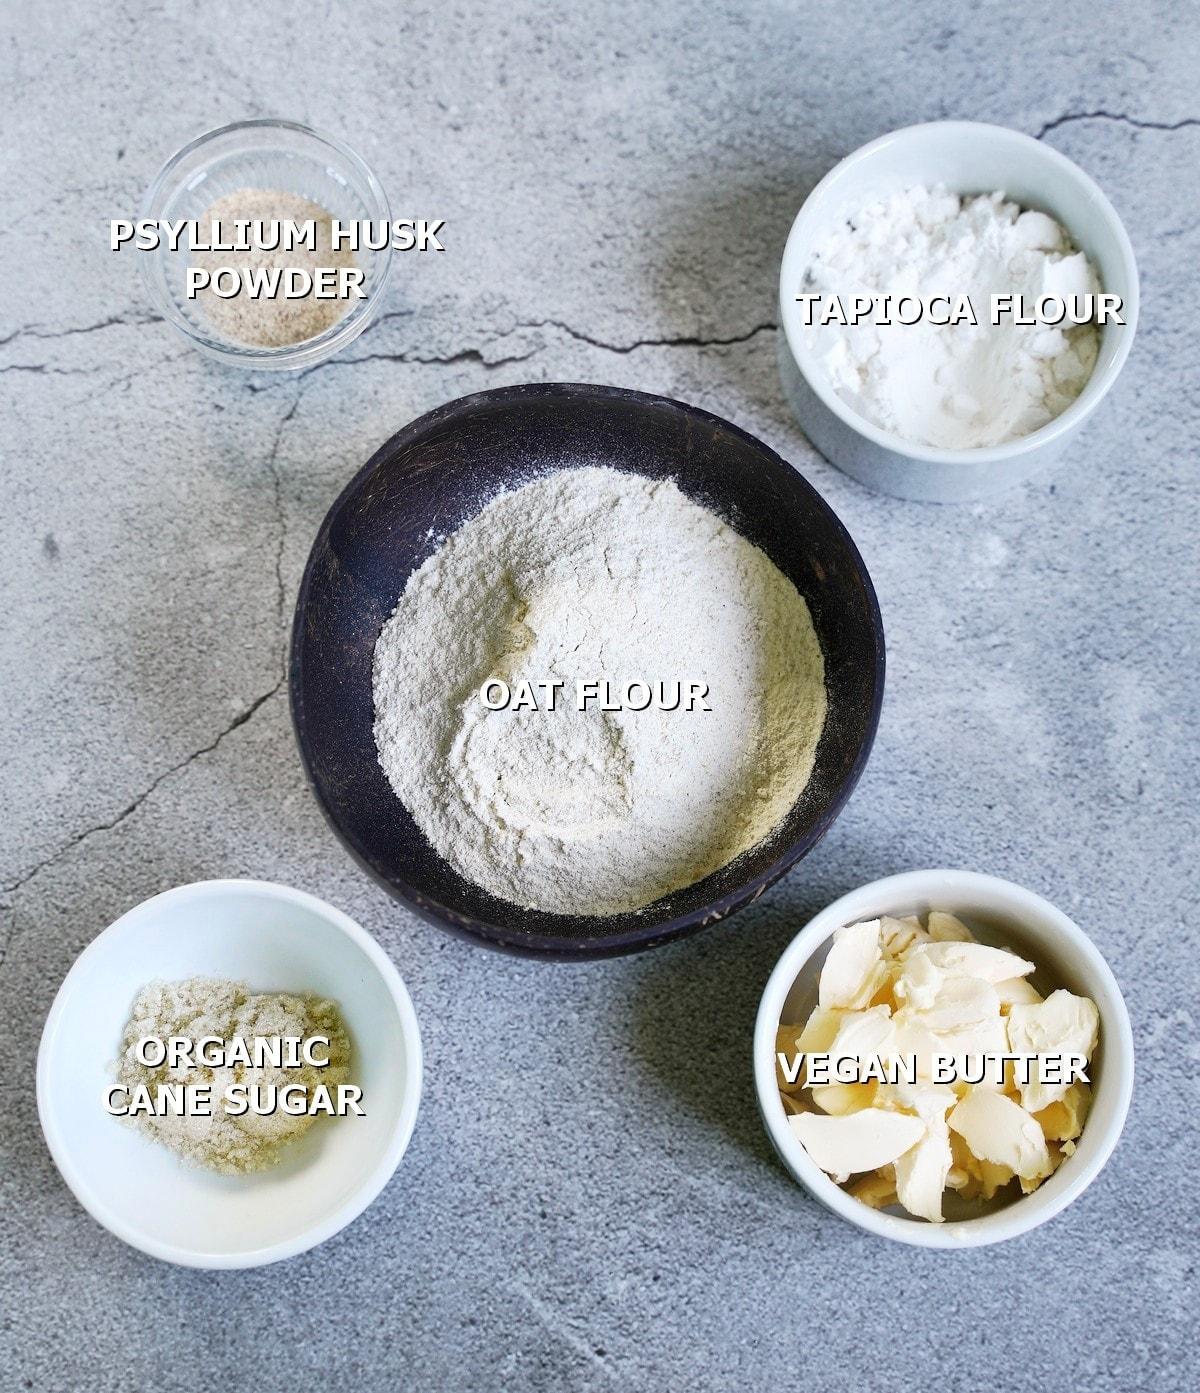 ingredients for vegan pastry